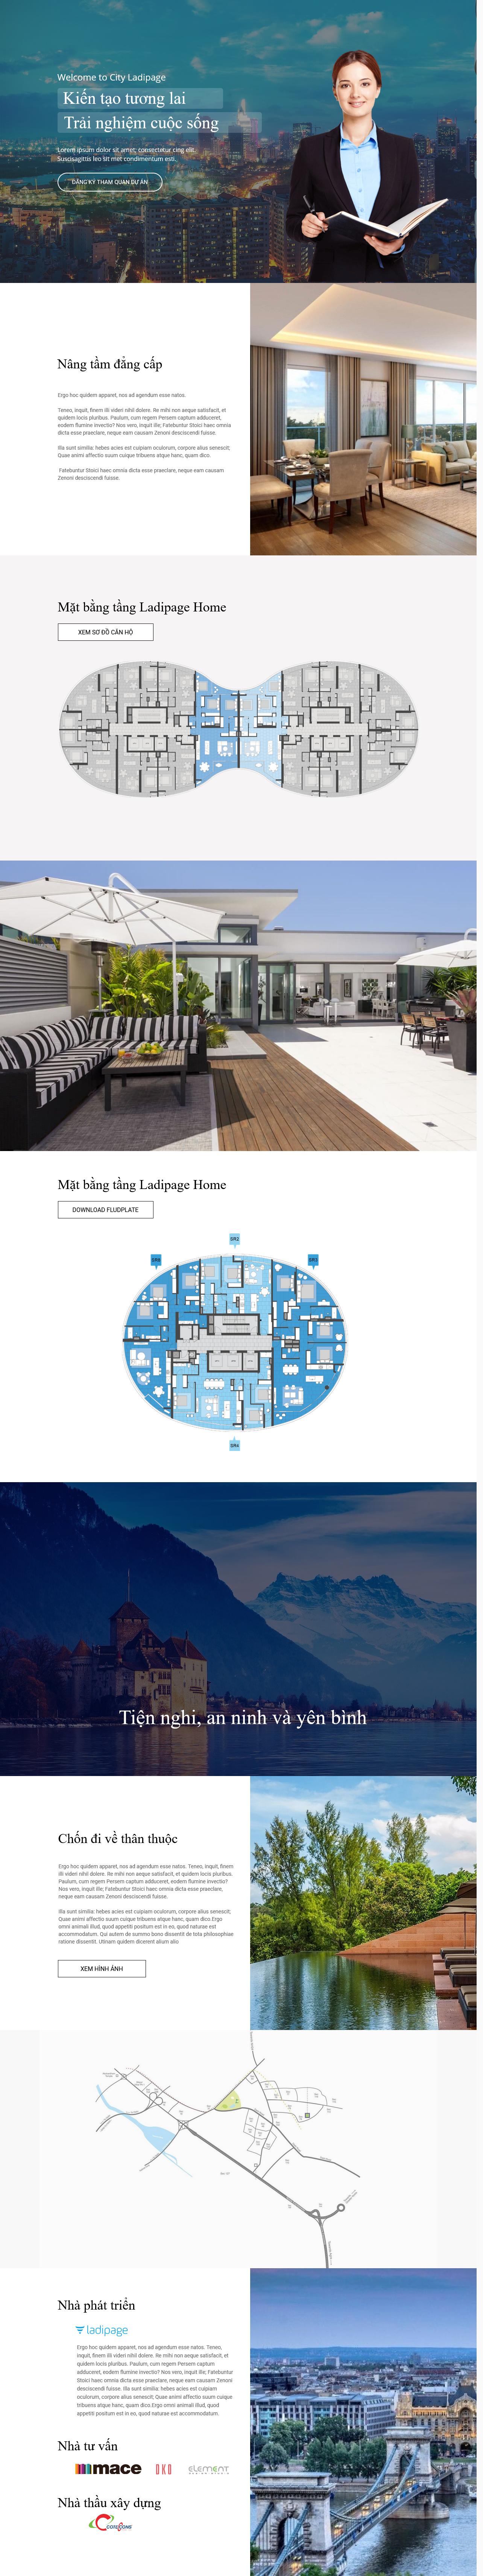 Thiết kế website Thiết kế webiste landingpage bat-dong-san Bất động sản 20